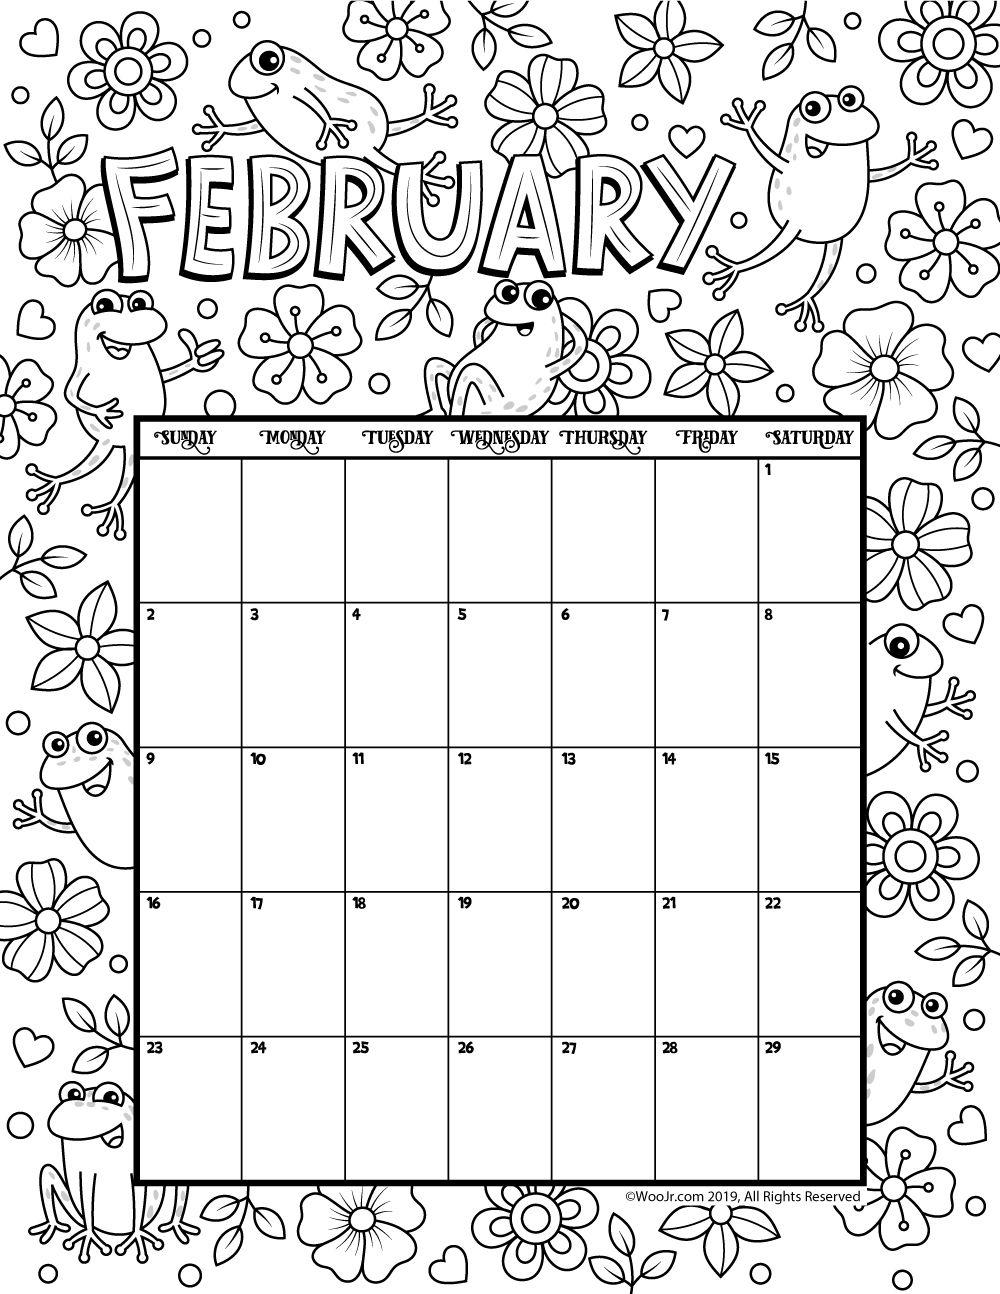 February 2020 Coloring Calendar Kids calendar, Coloring